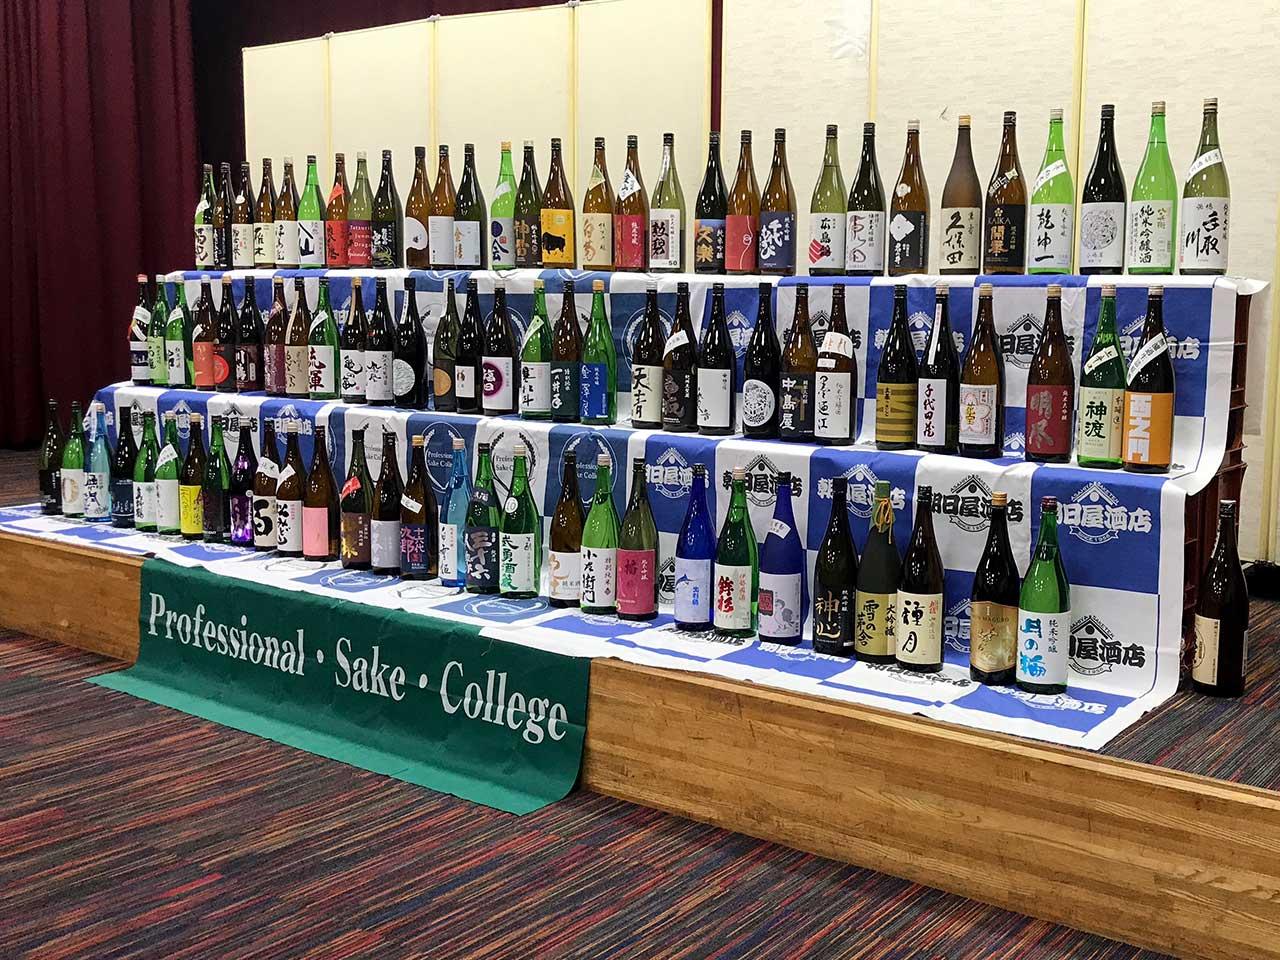 Professional Sake College